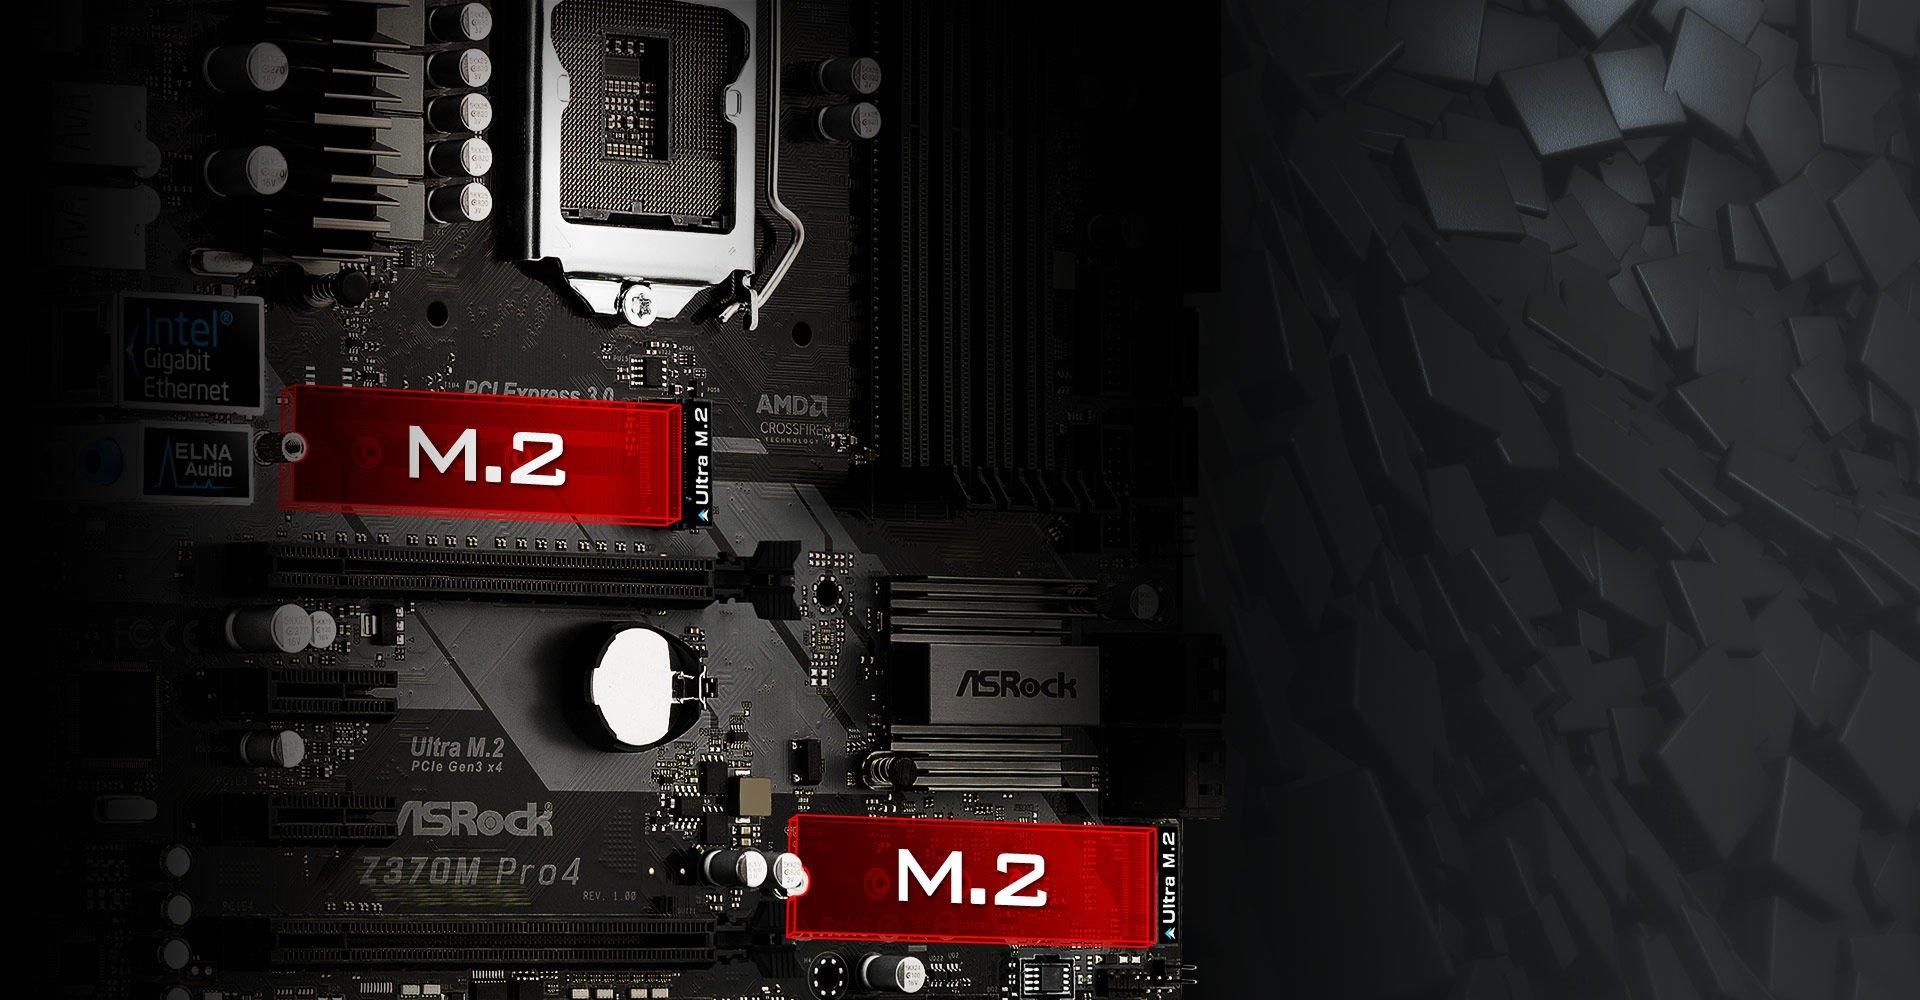 DualM2-SSD-Z370M%20Pro4.jpg